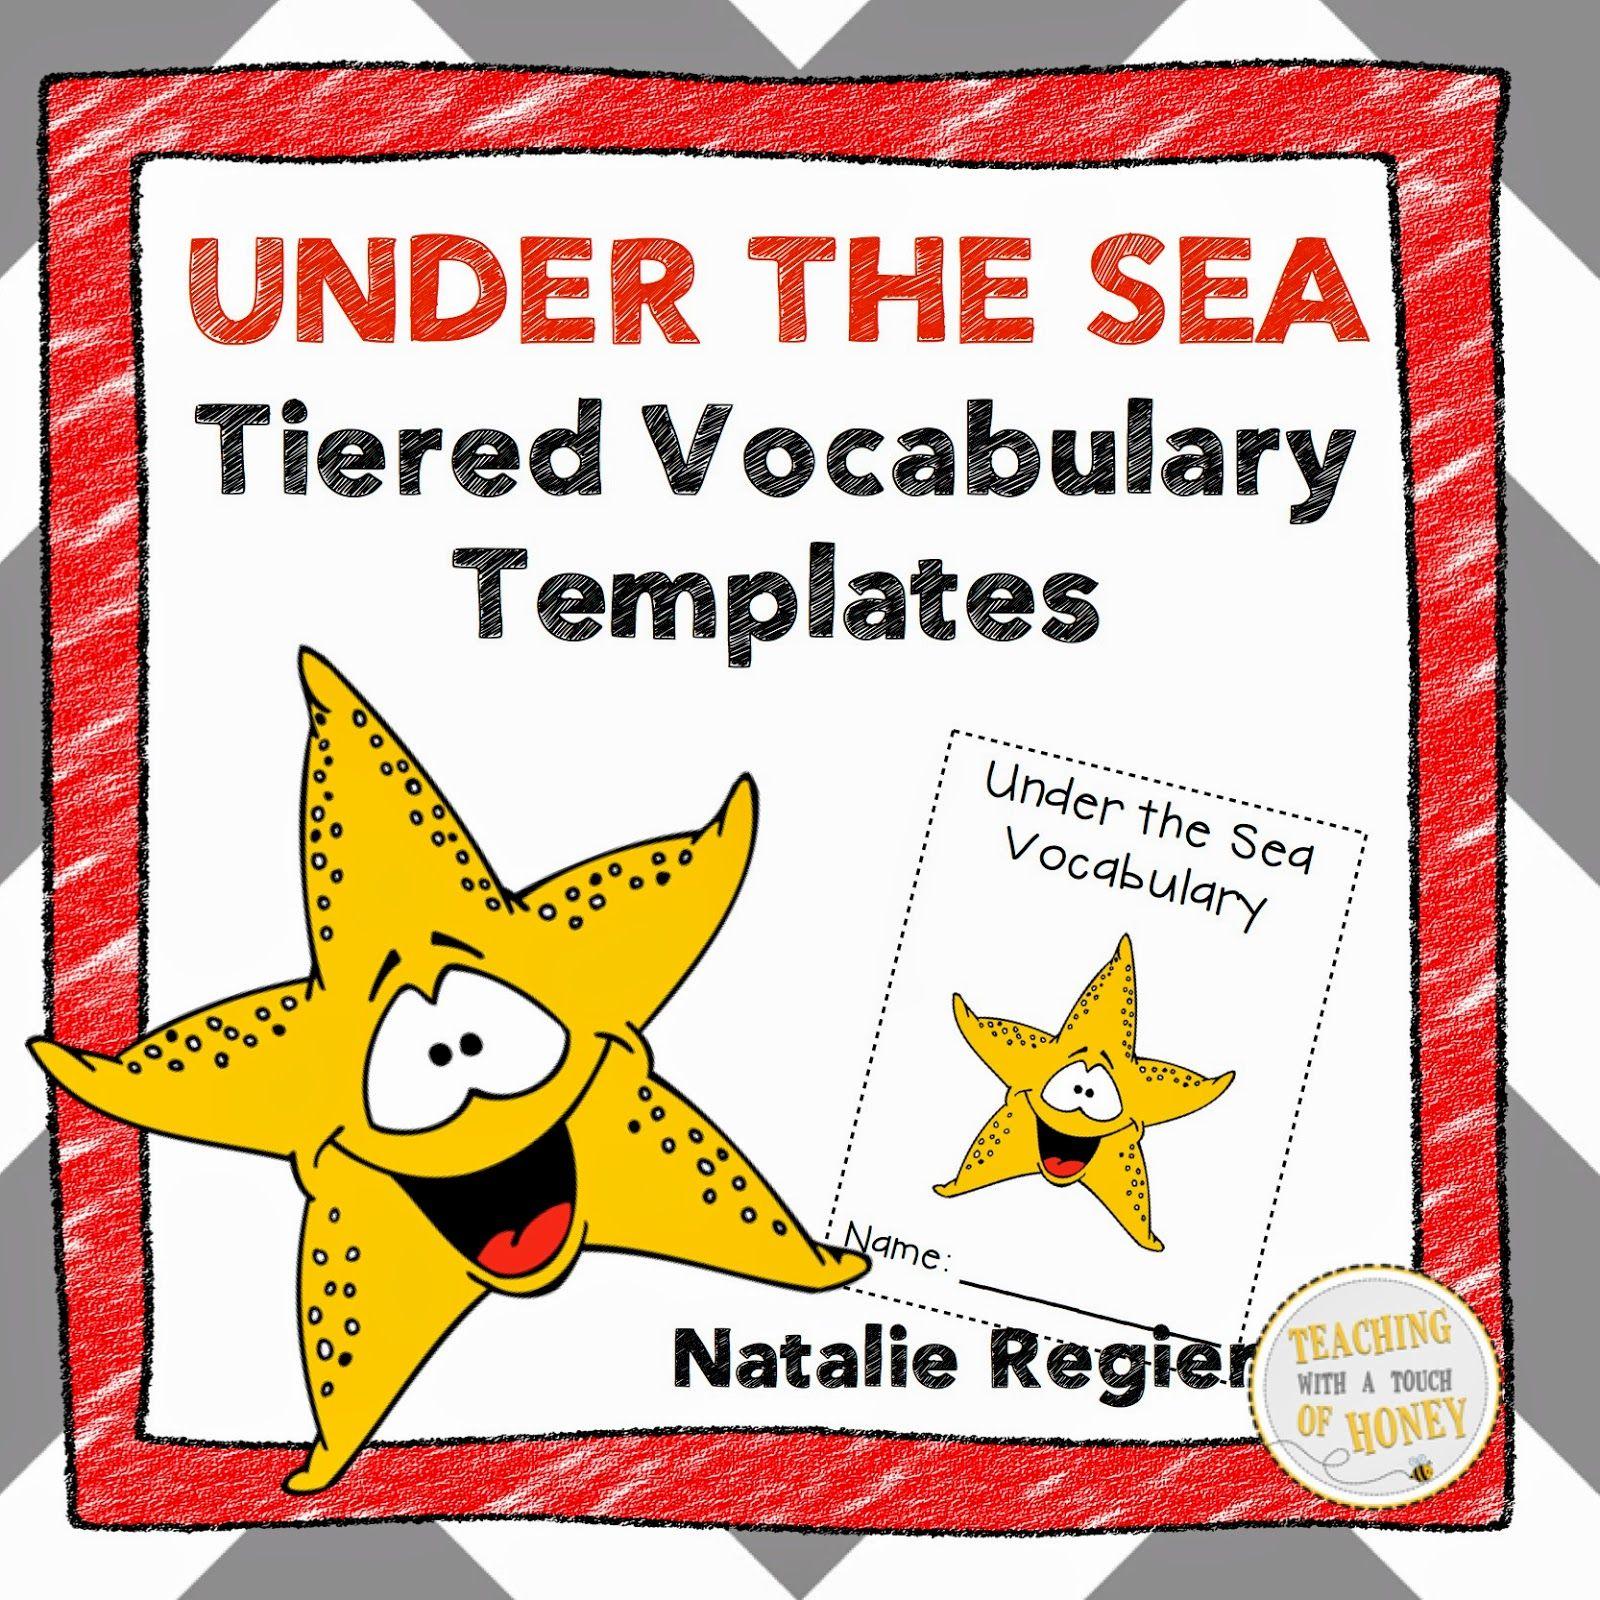 Under The Sea Tiered Vocabulary Templates Freebie